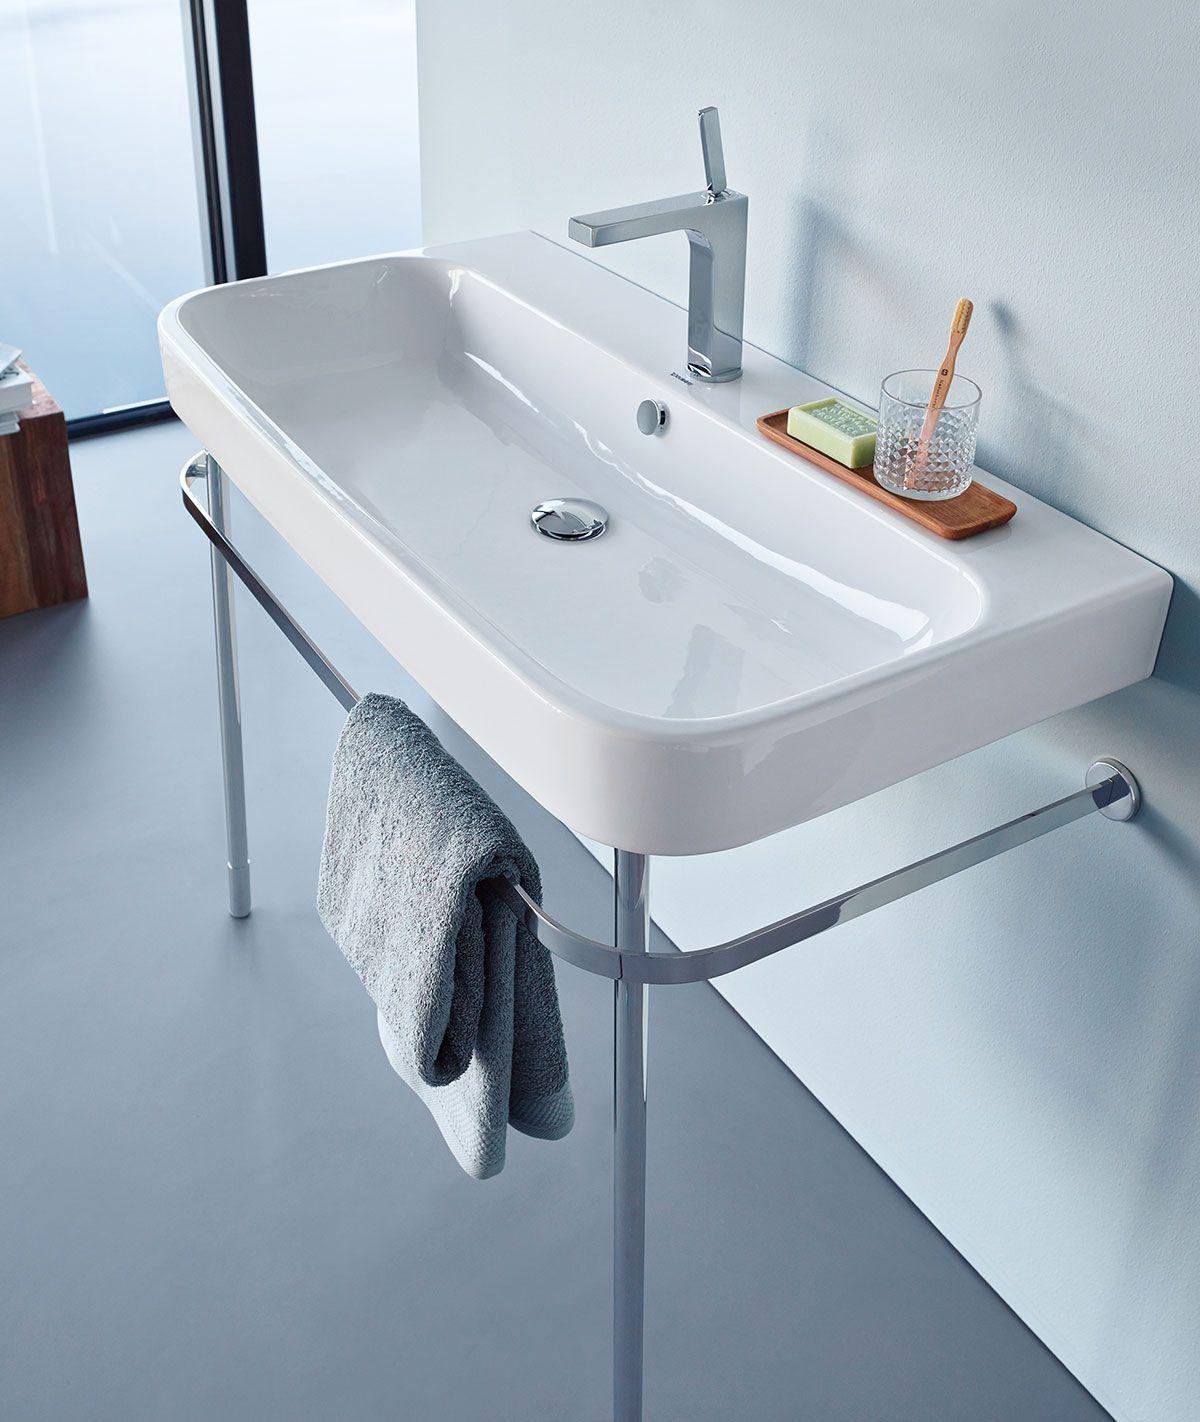 Duravit Happy D.2 Furniture Basin 1000mm   Duravit, Basin and Toilet